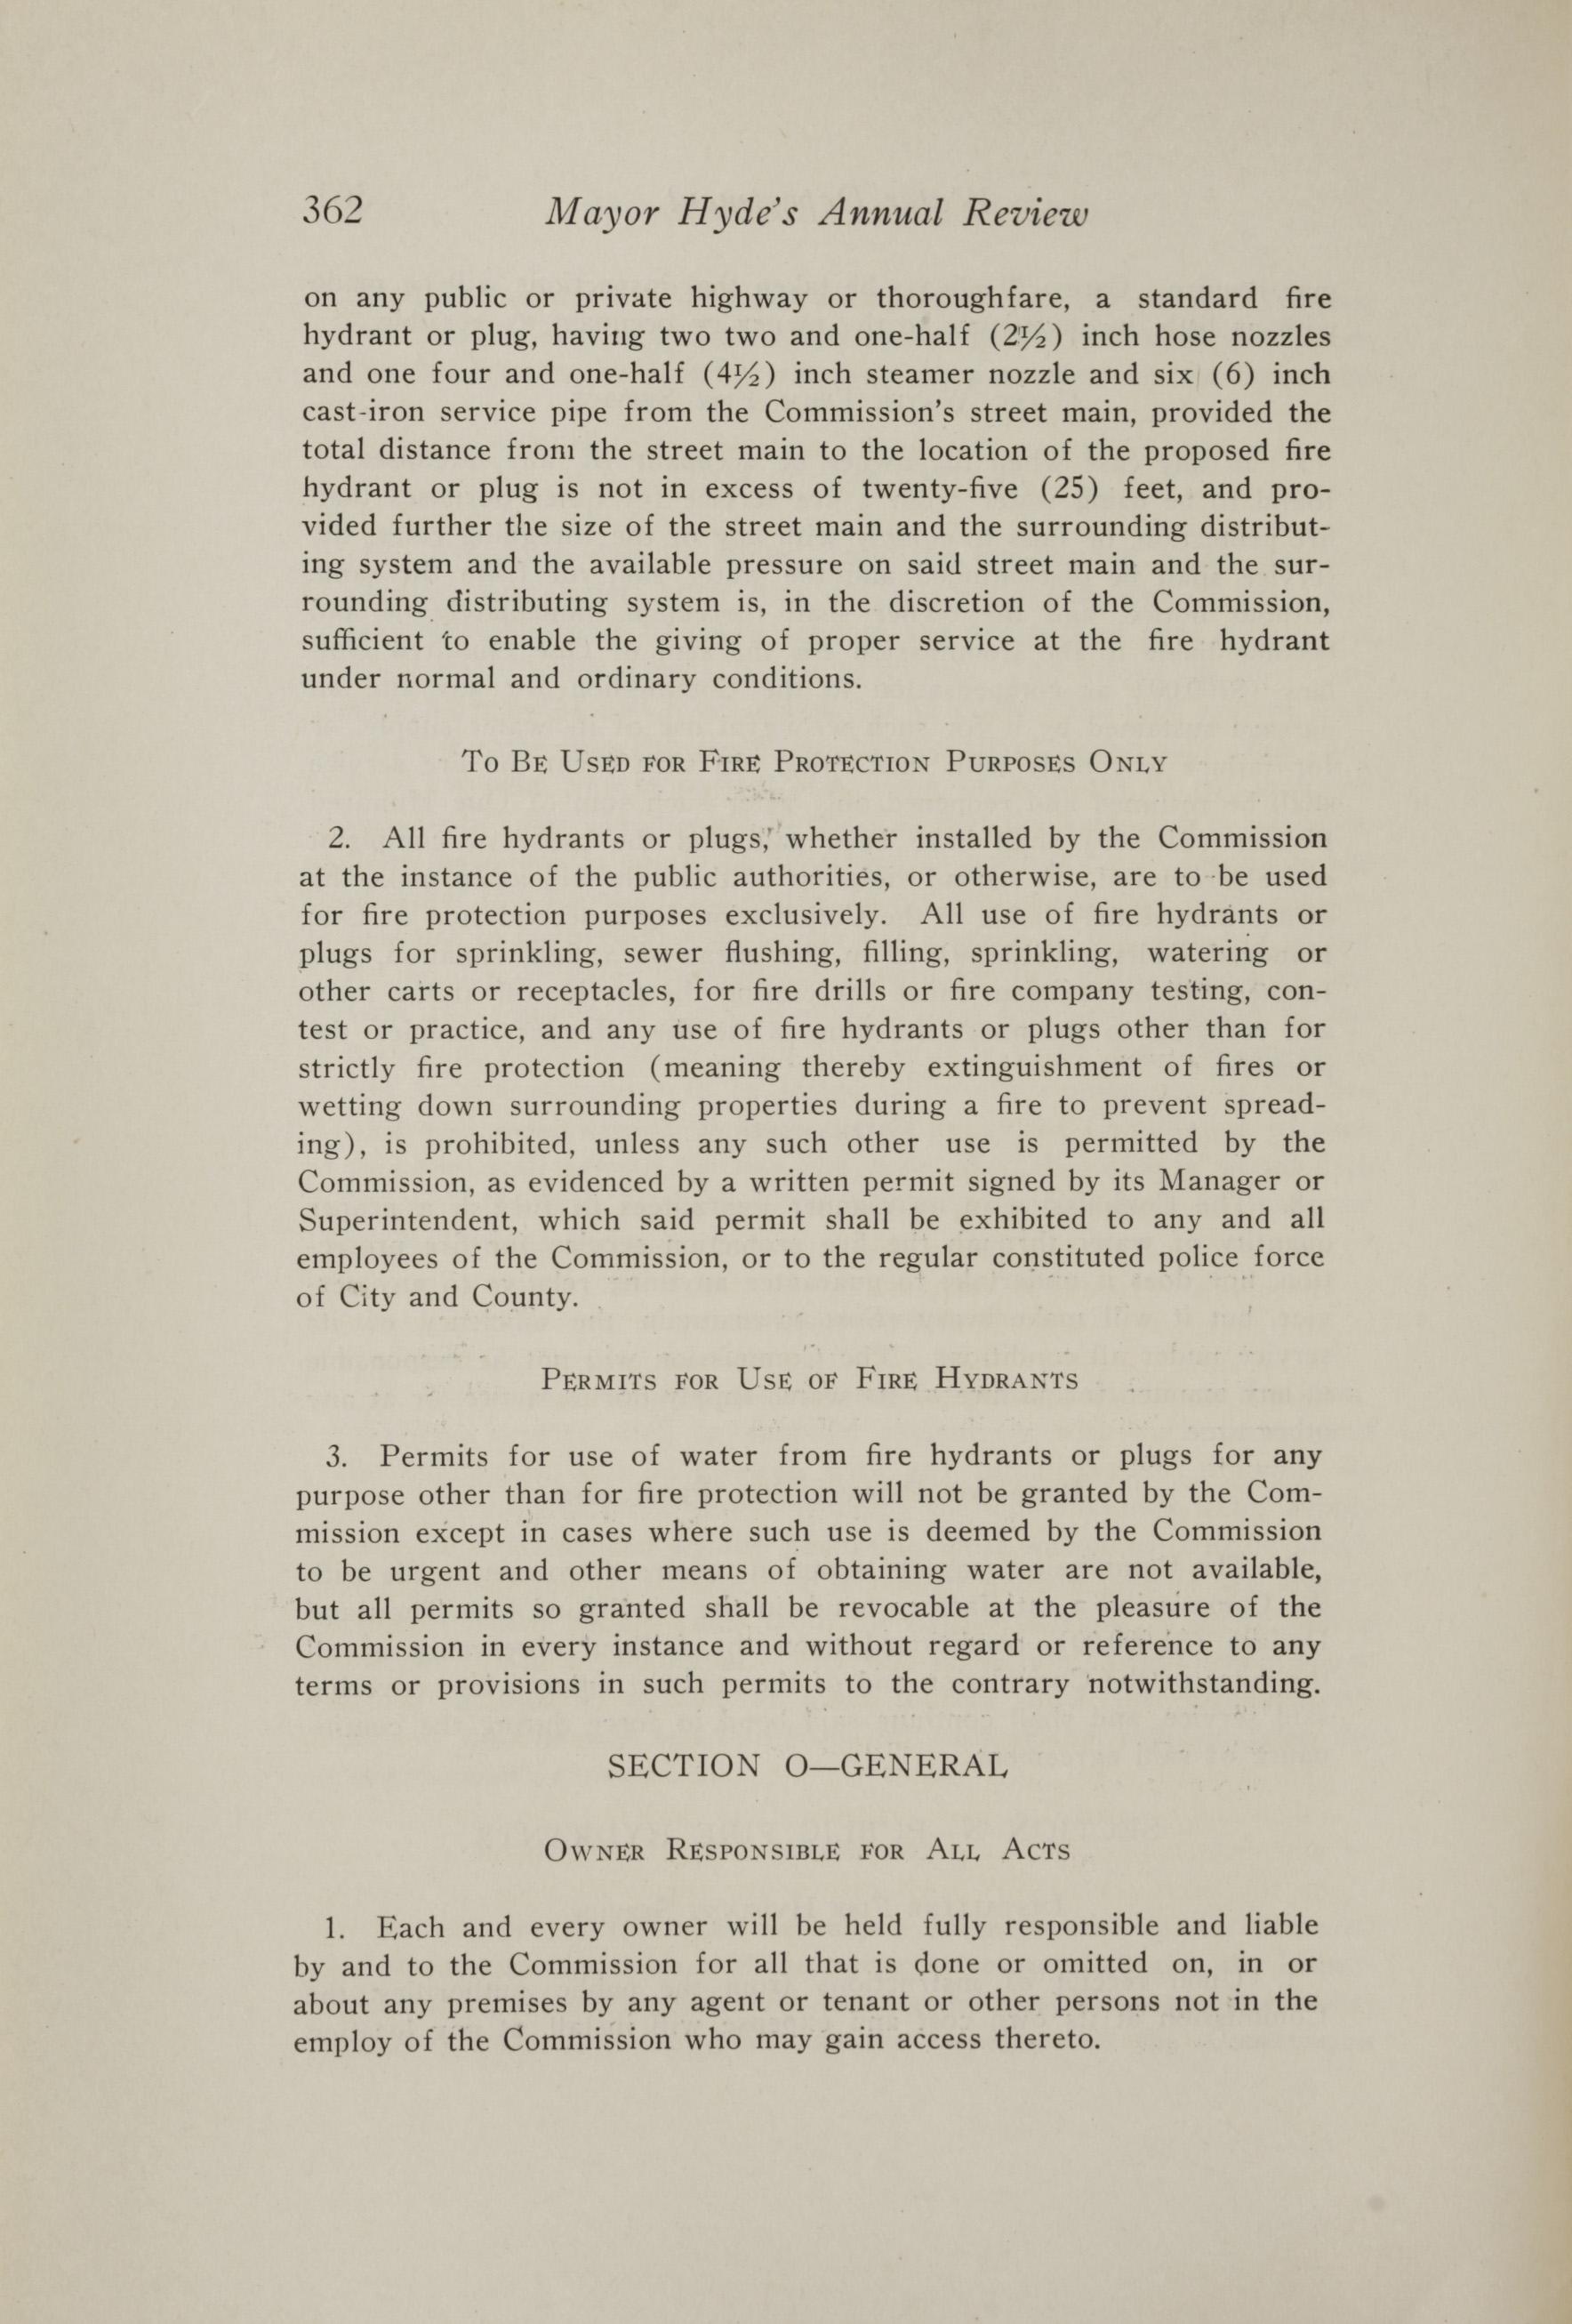 Charleston Yearbook, 1917, page 362